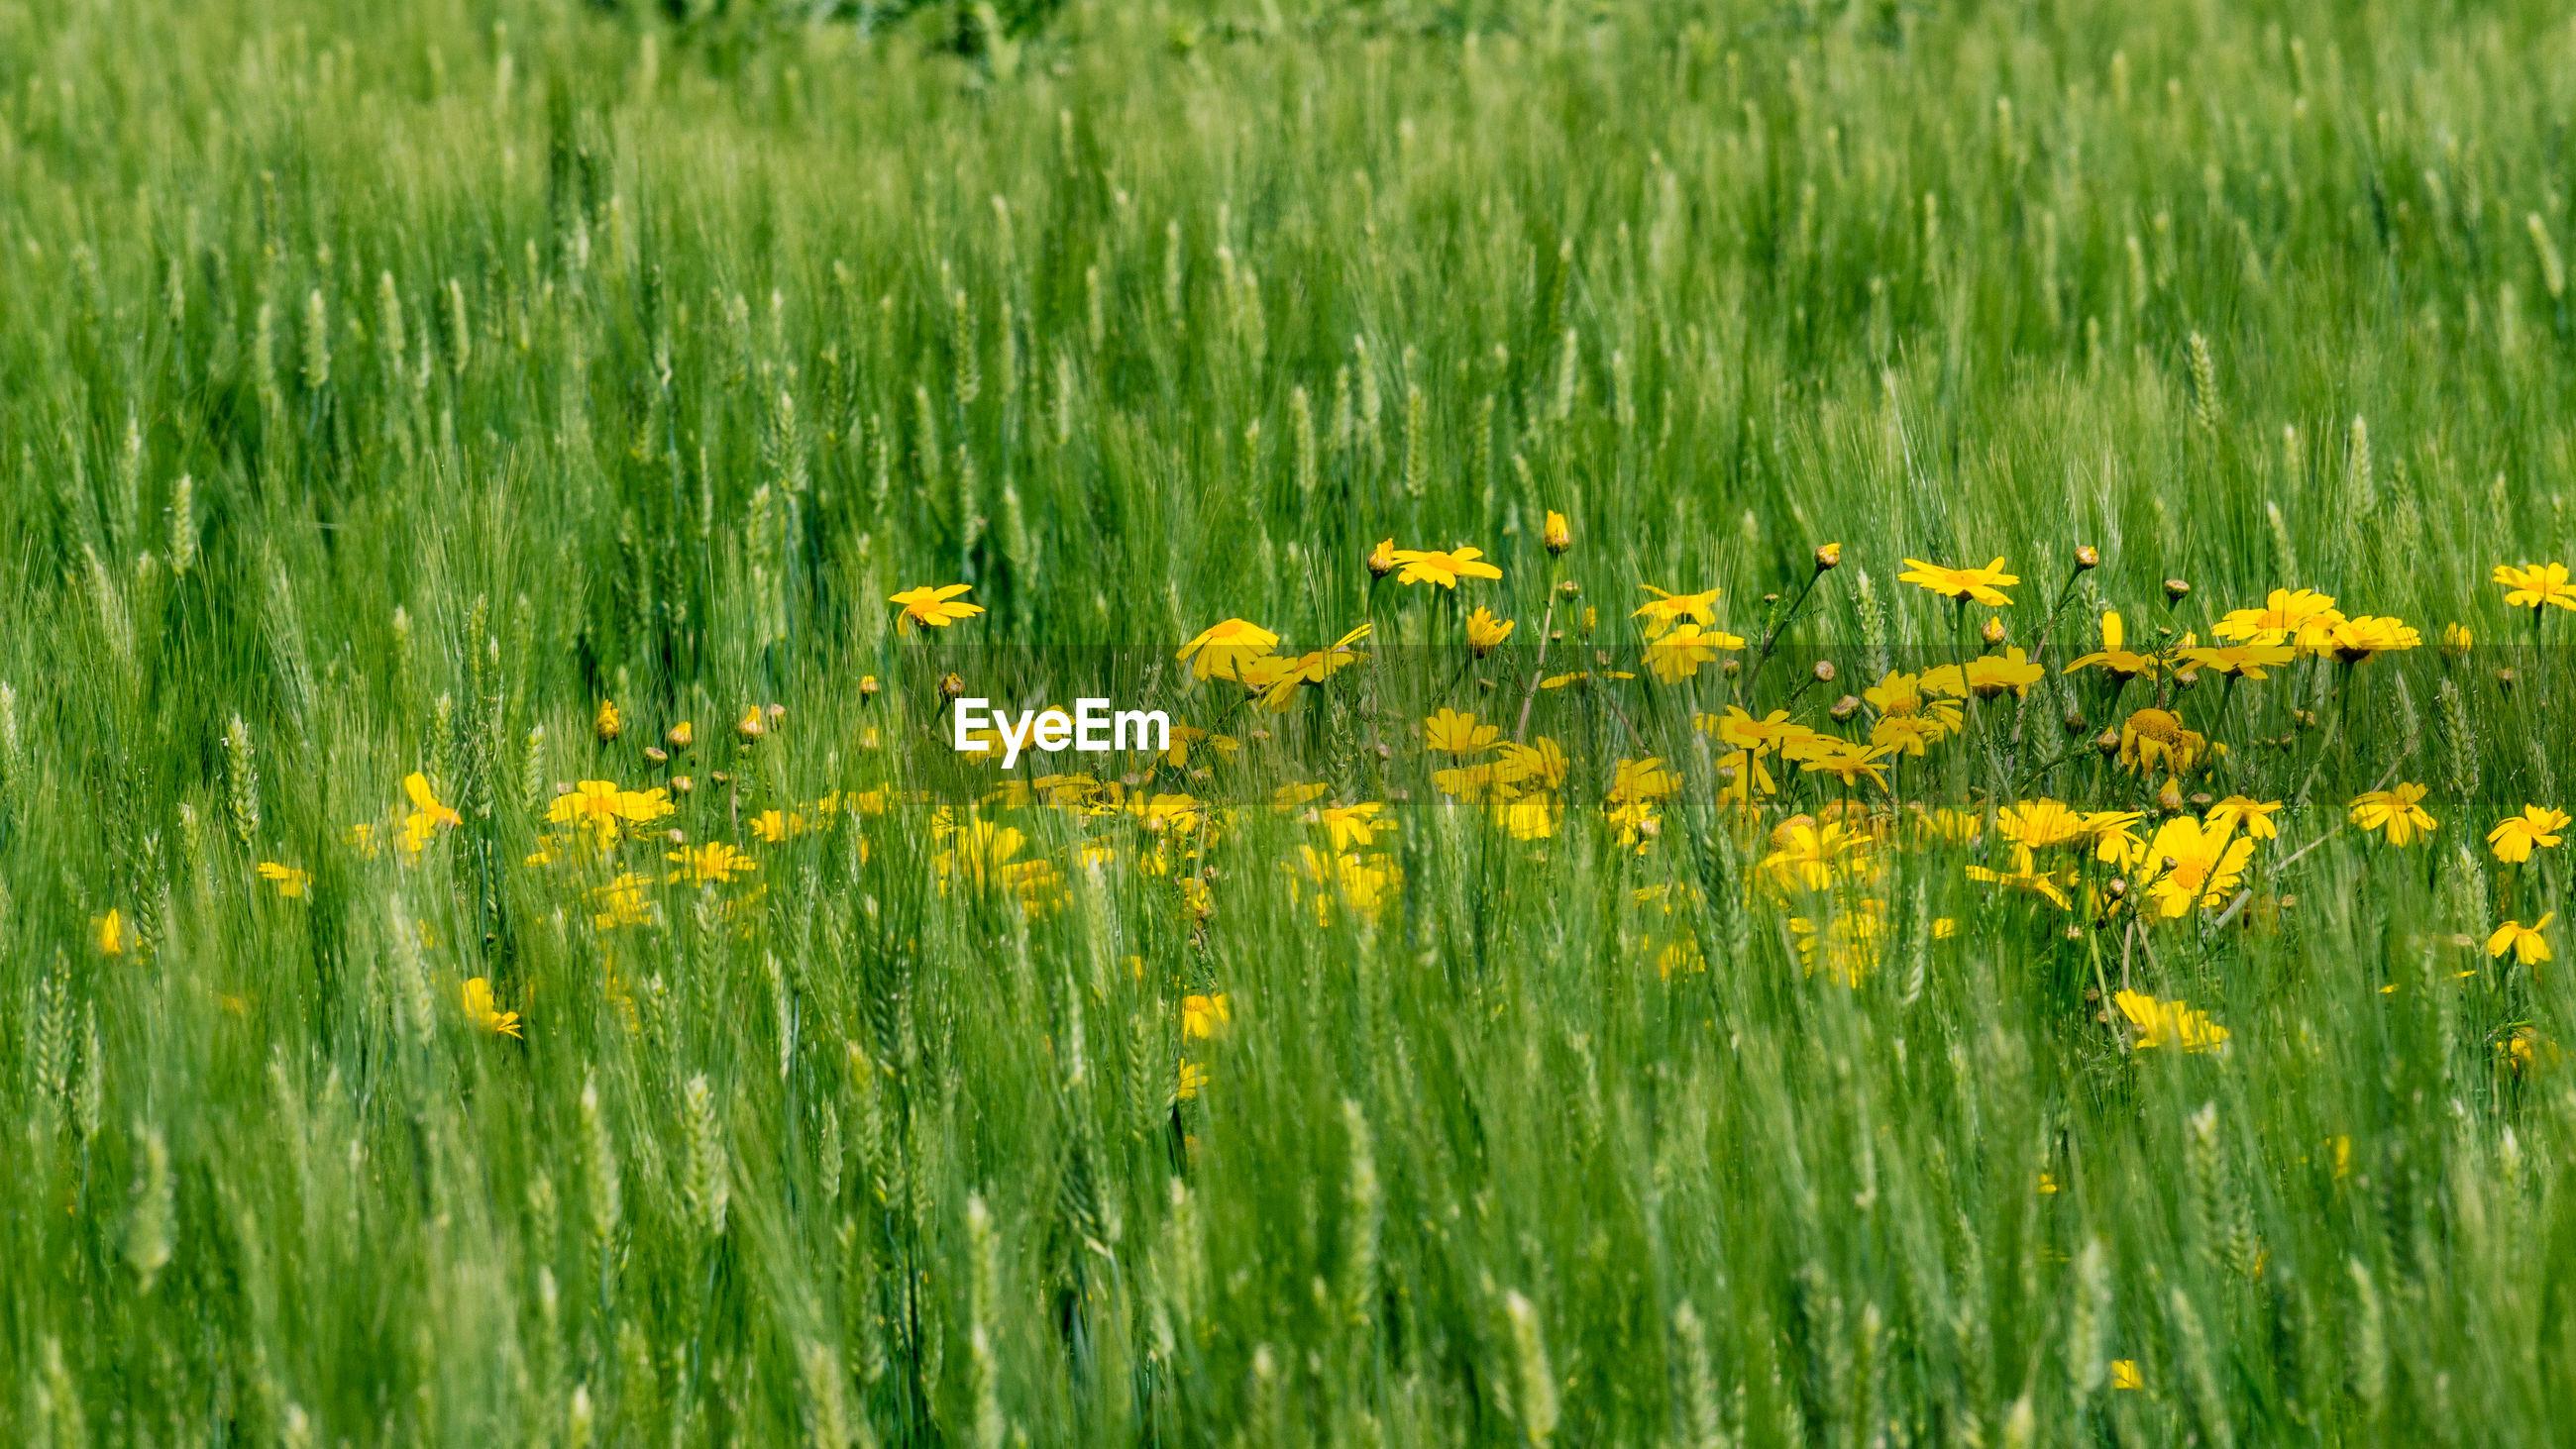 YELLOW FLOWERING PLANTS GROWING ON FIELD DURING RAINY SEASON